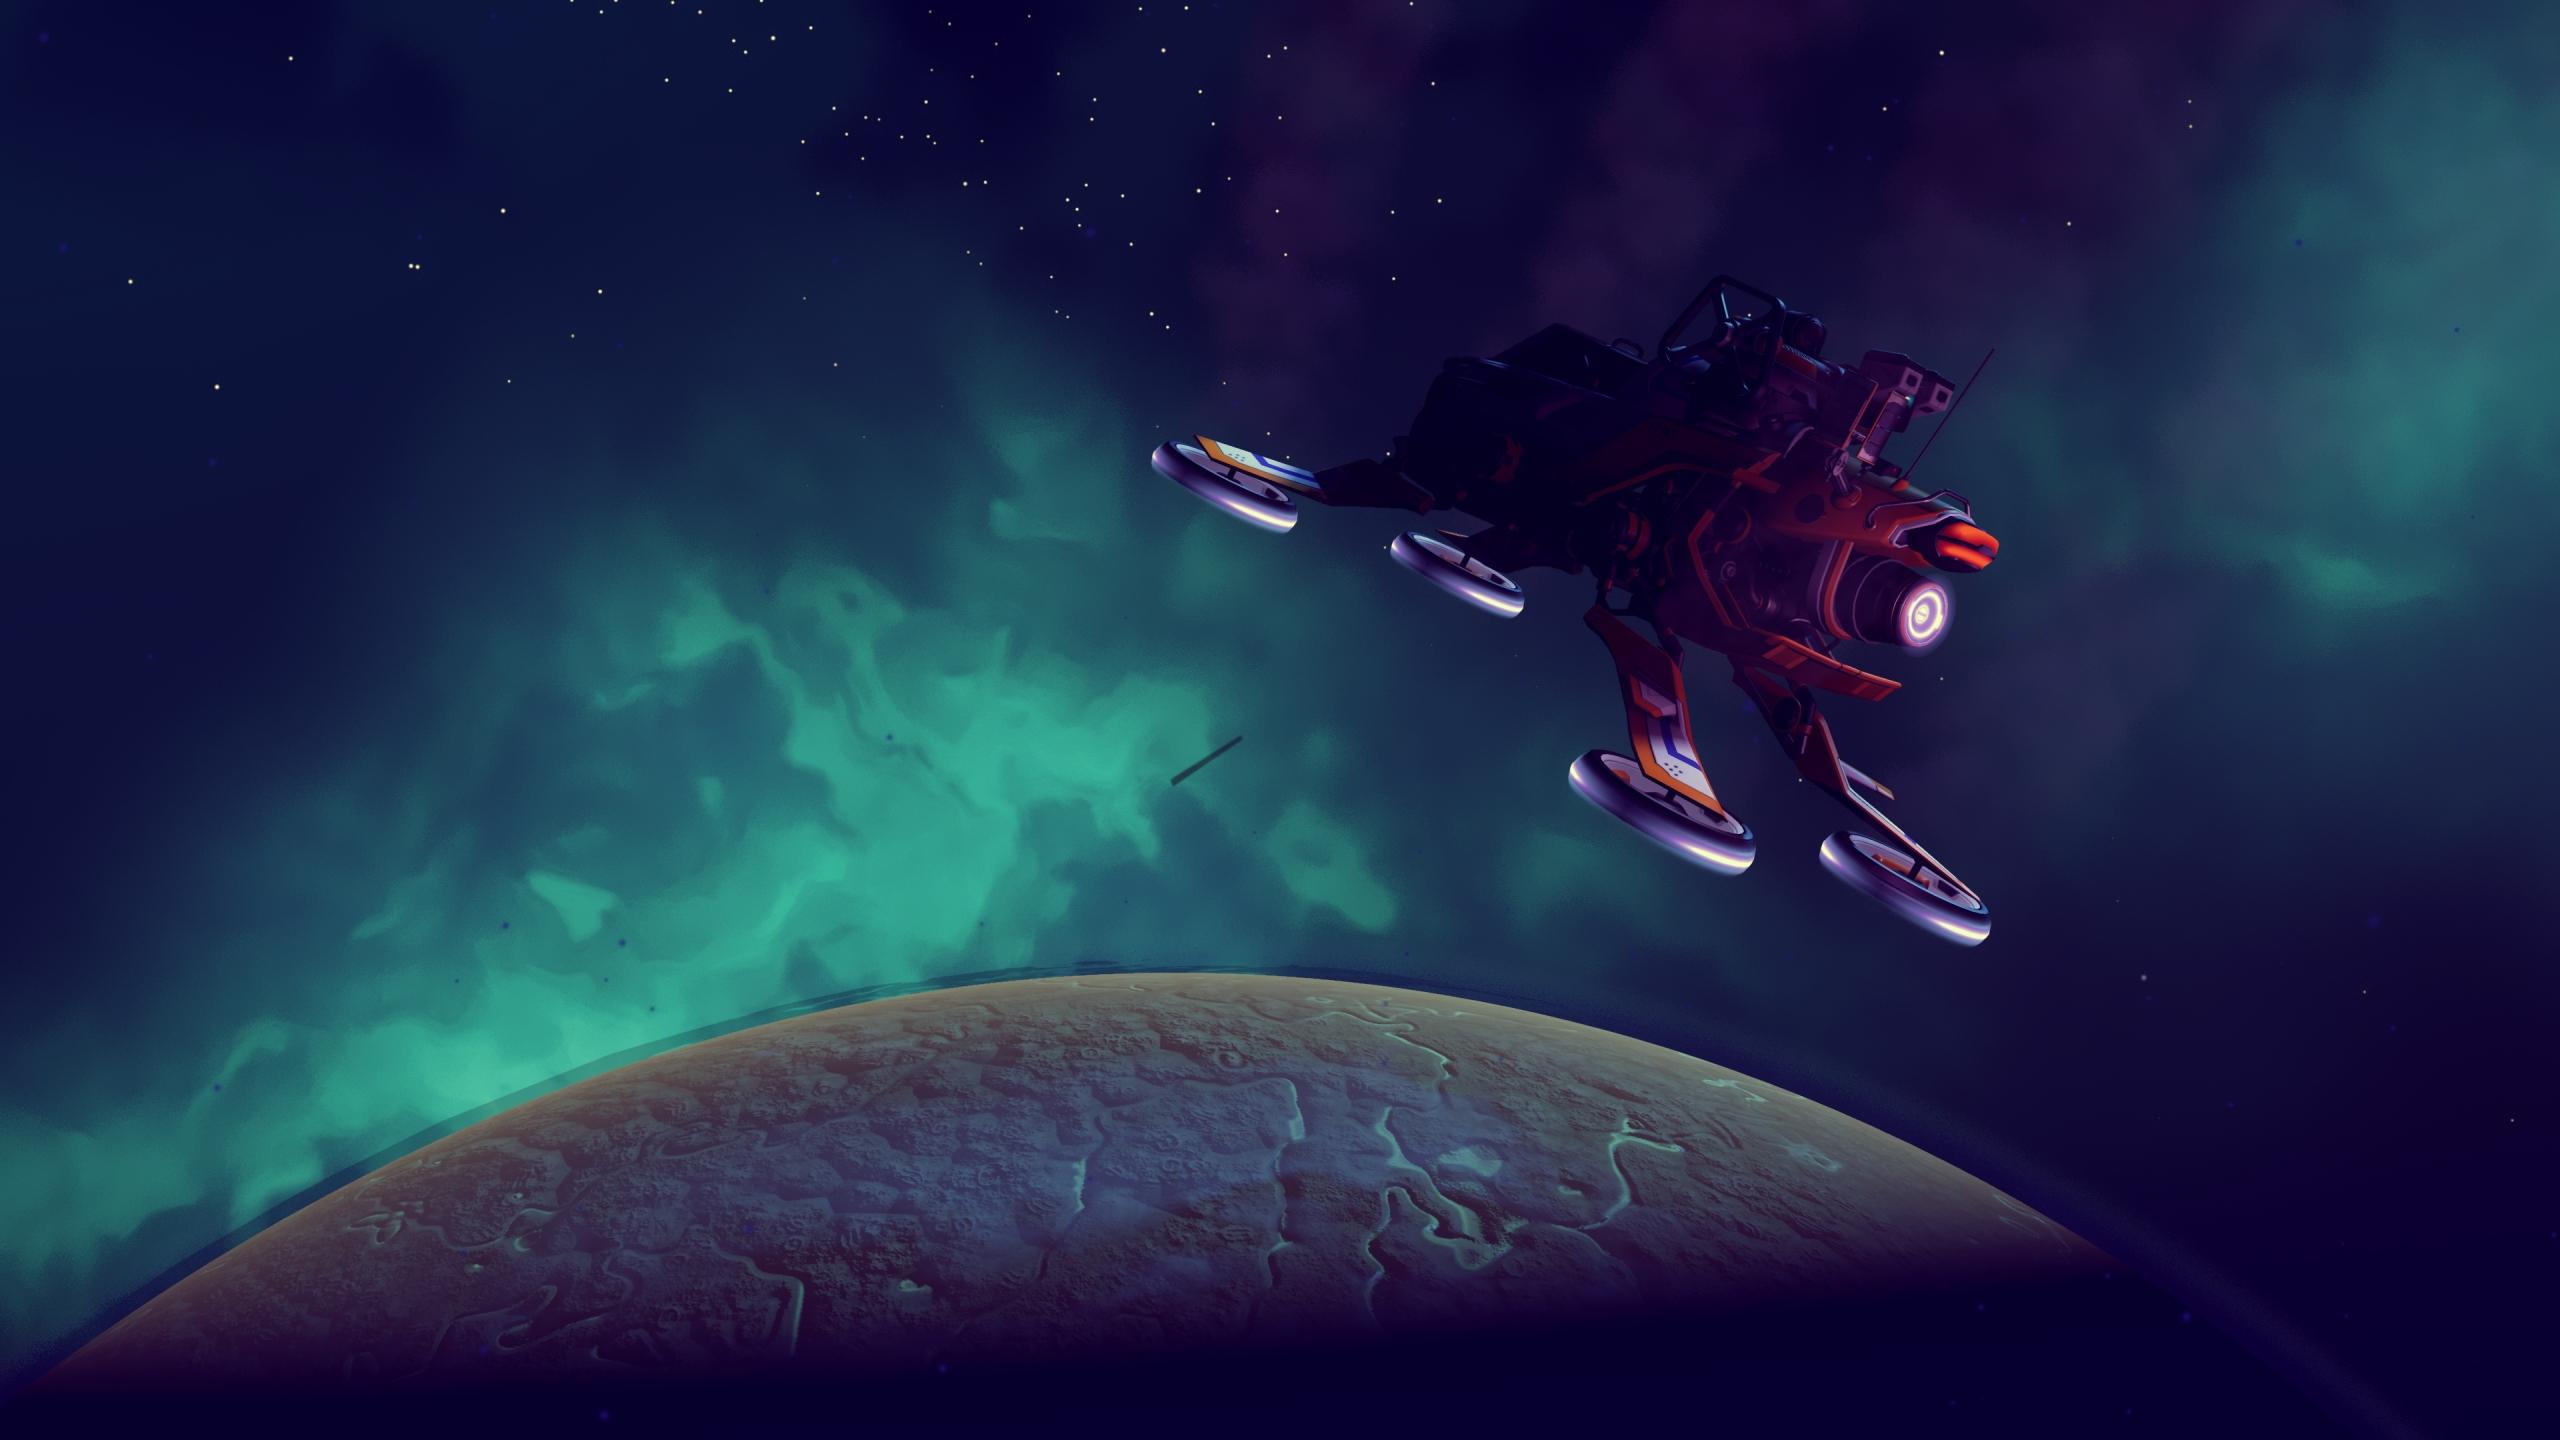 2560x1440 No Man S Sky Spaceship 1440p Resolution Wallpaper Hd